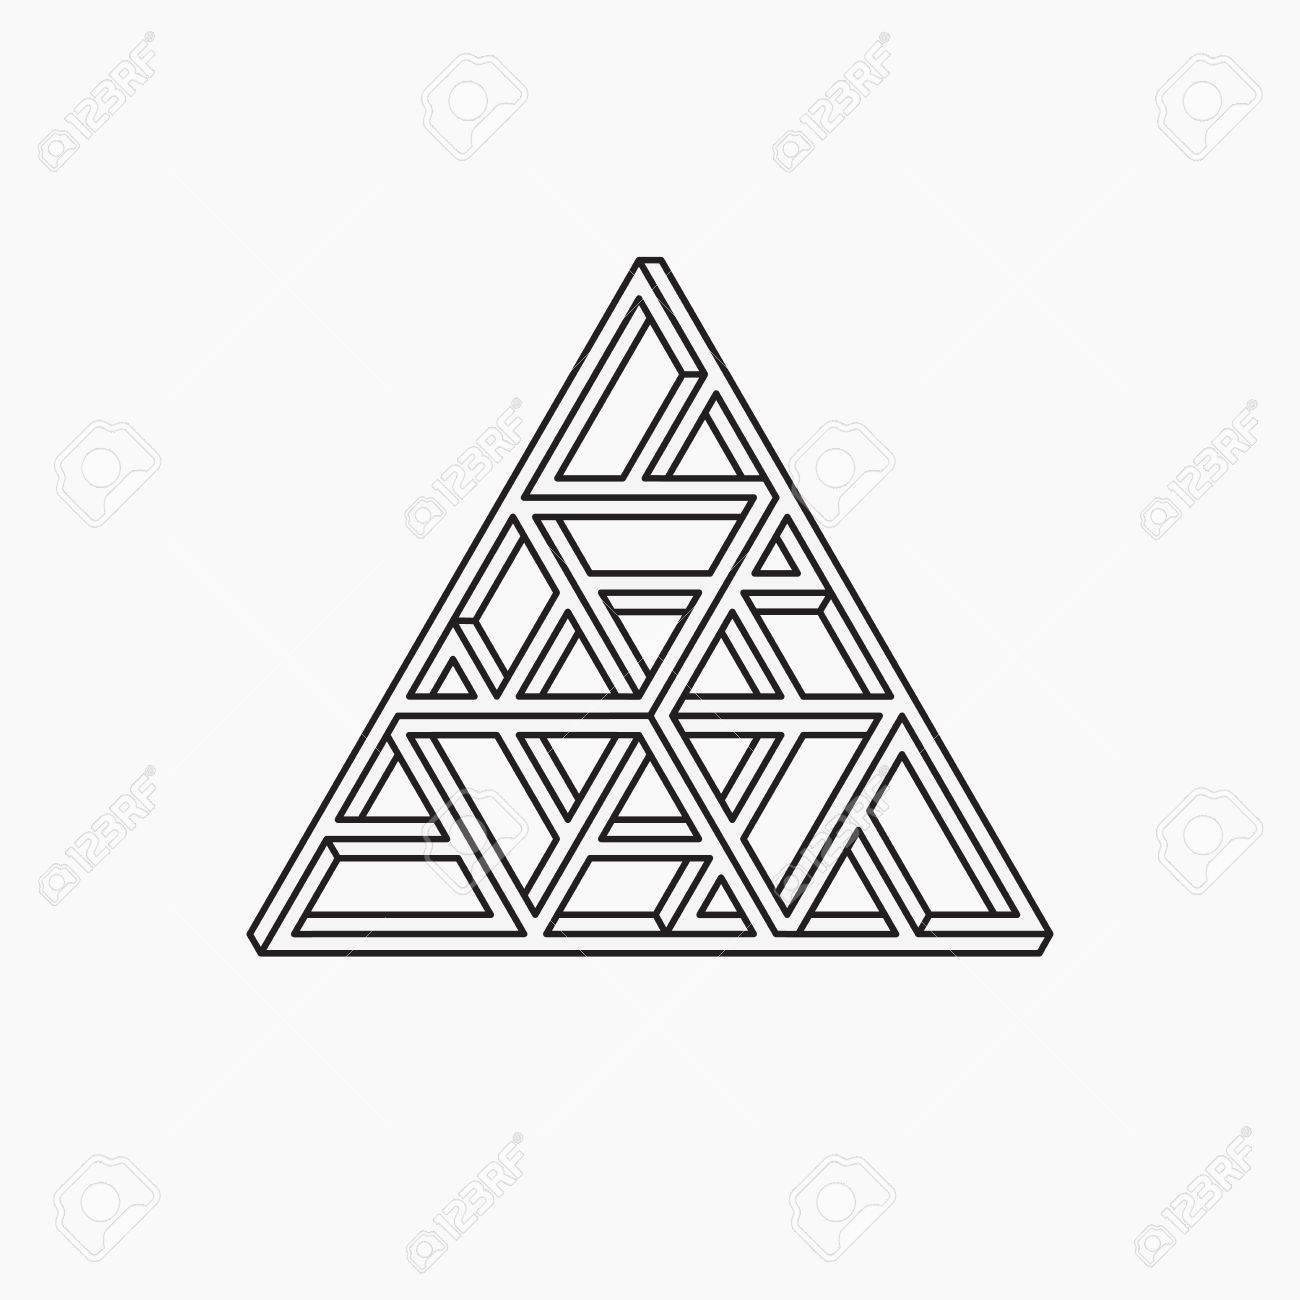 1300x1300 Impossible Shape. Triangle. Line Design. Vector Illustration